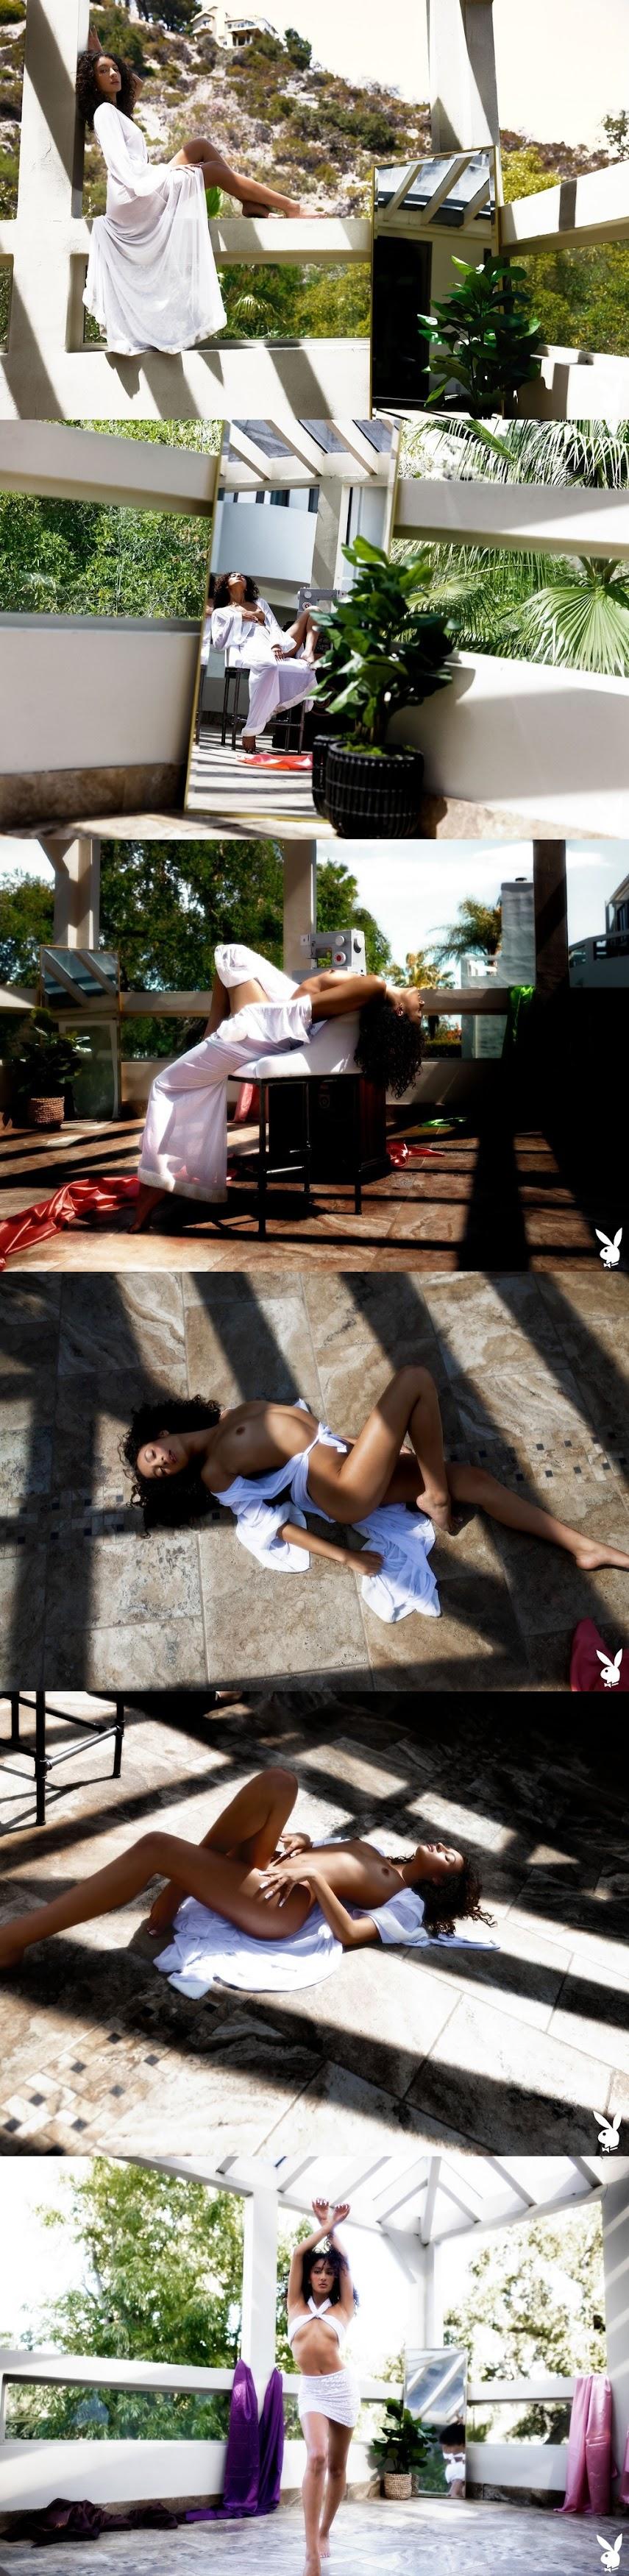 [Playboy Plus] Kyrah in Tailored to You sexy girls image jav